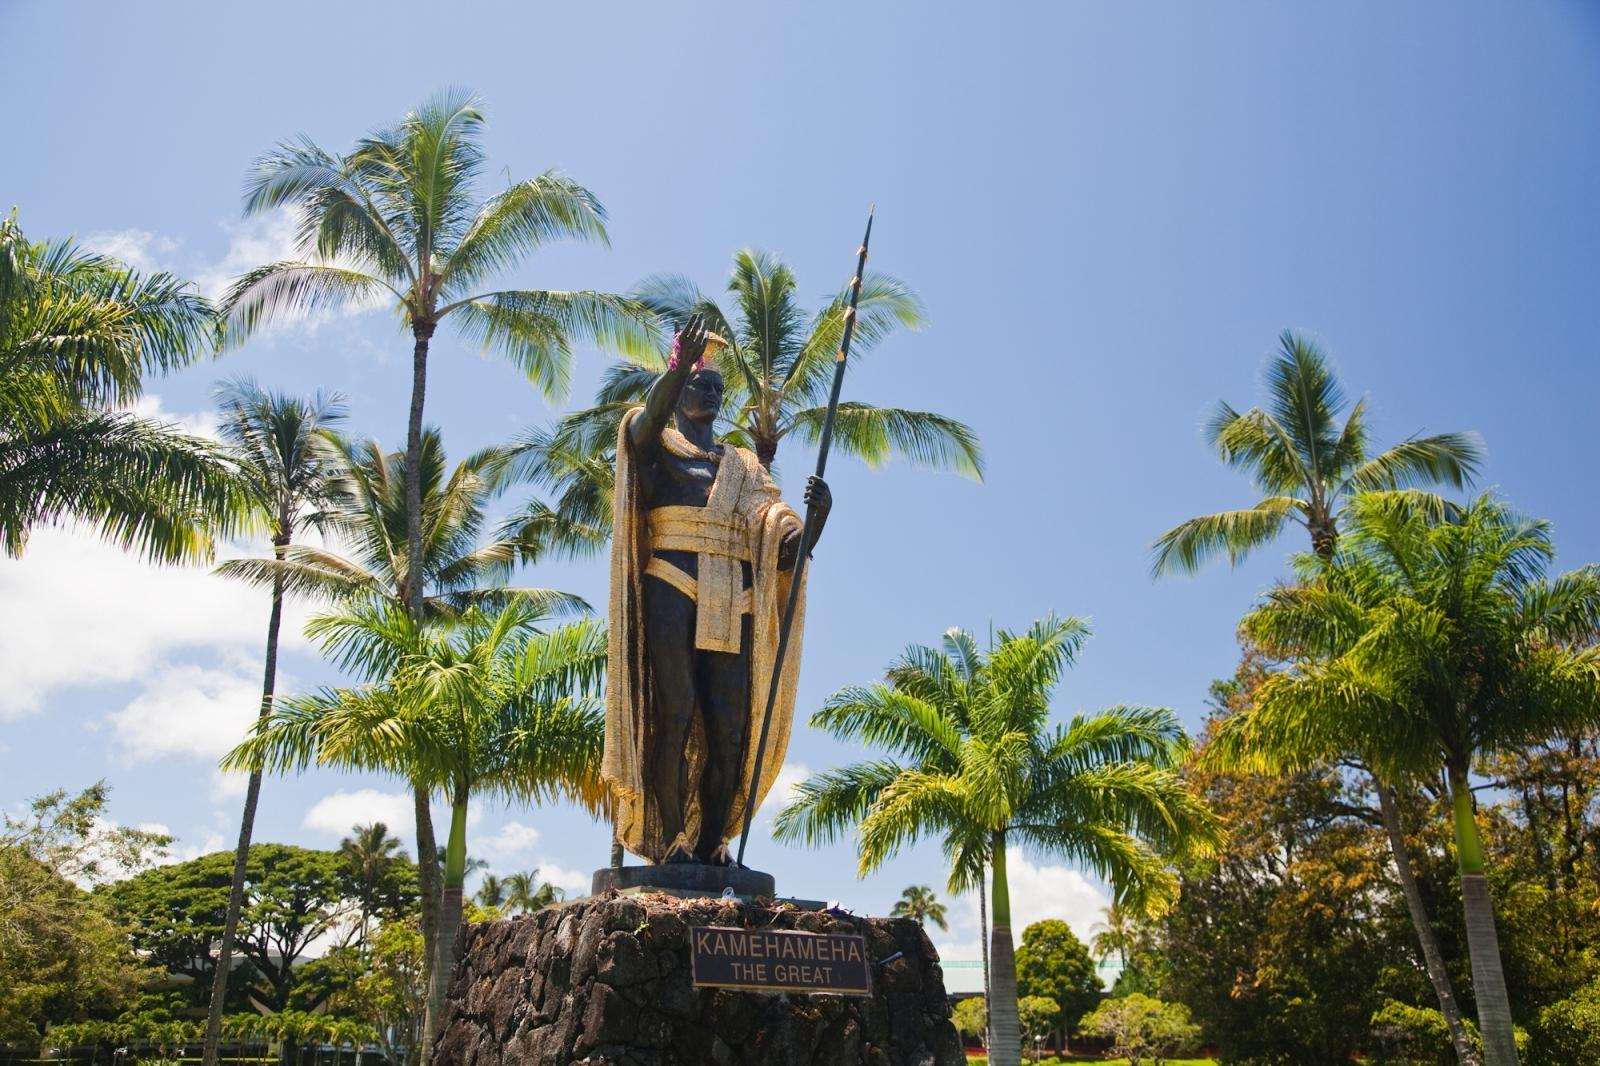 Hawaii Tourism Authority ( HTA) / Tor Johnson